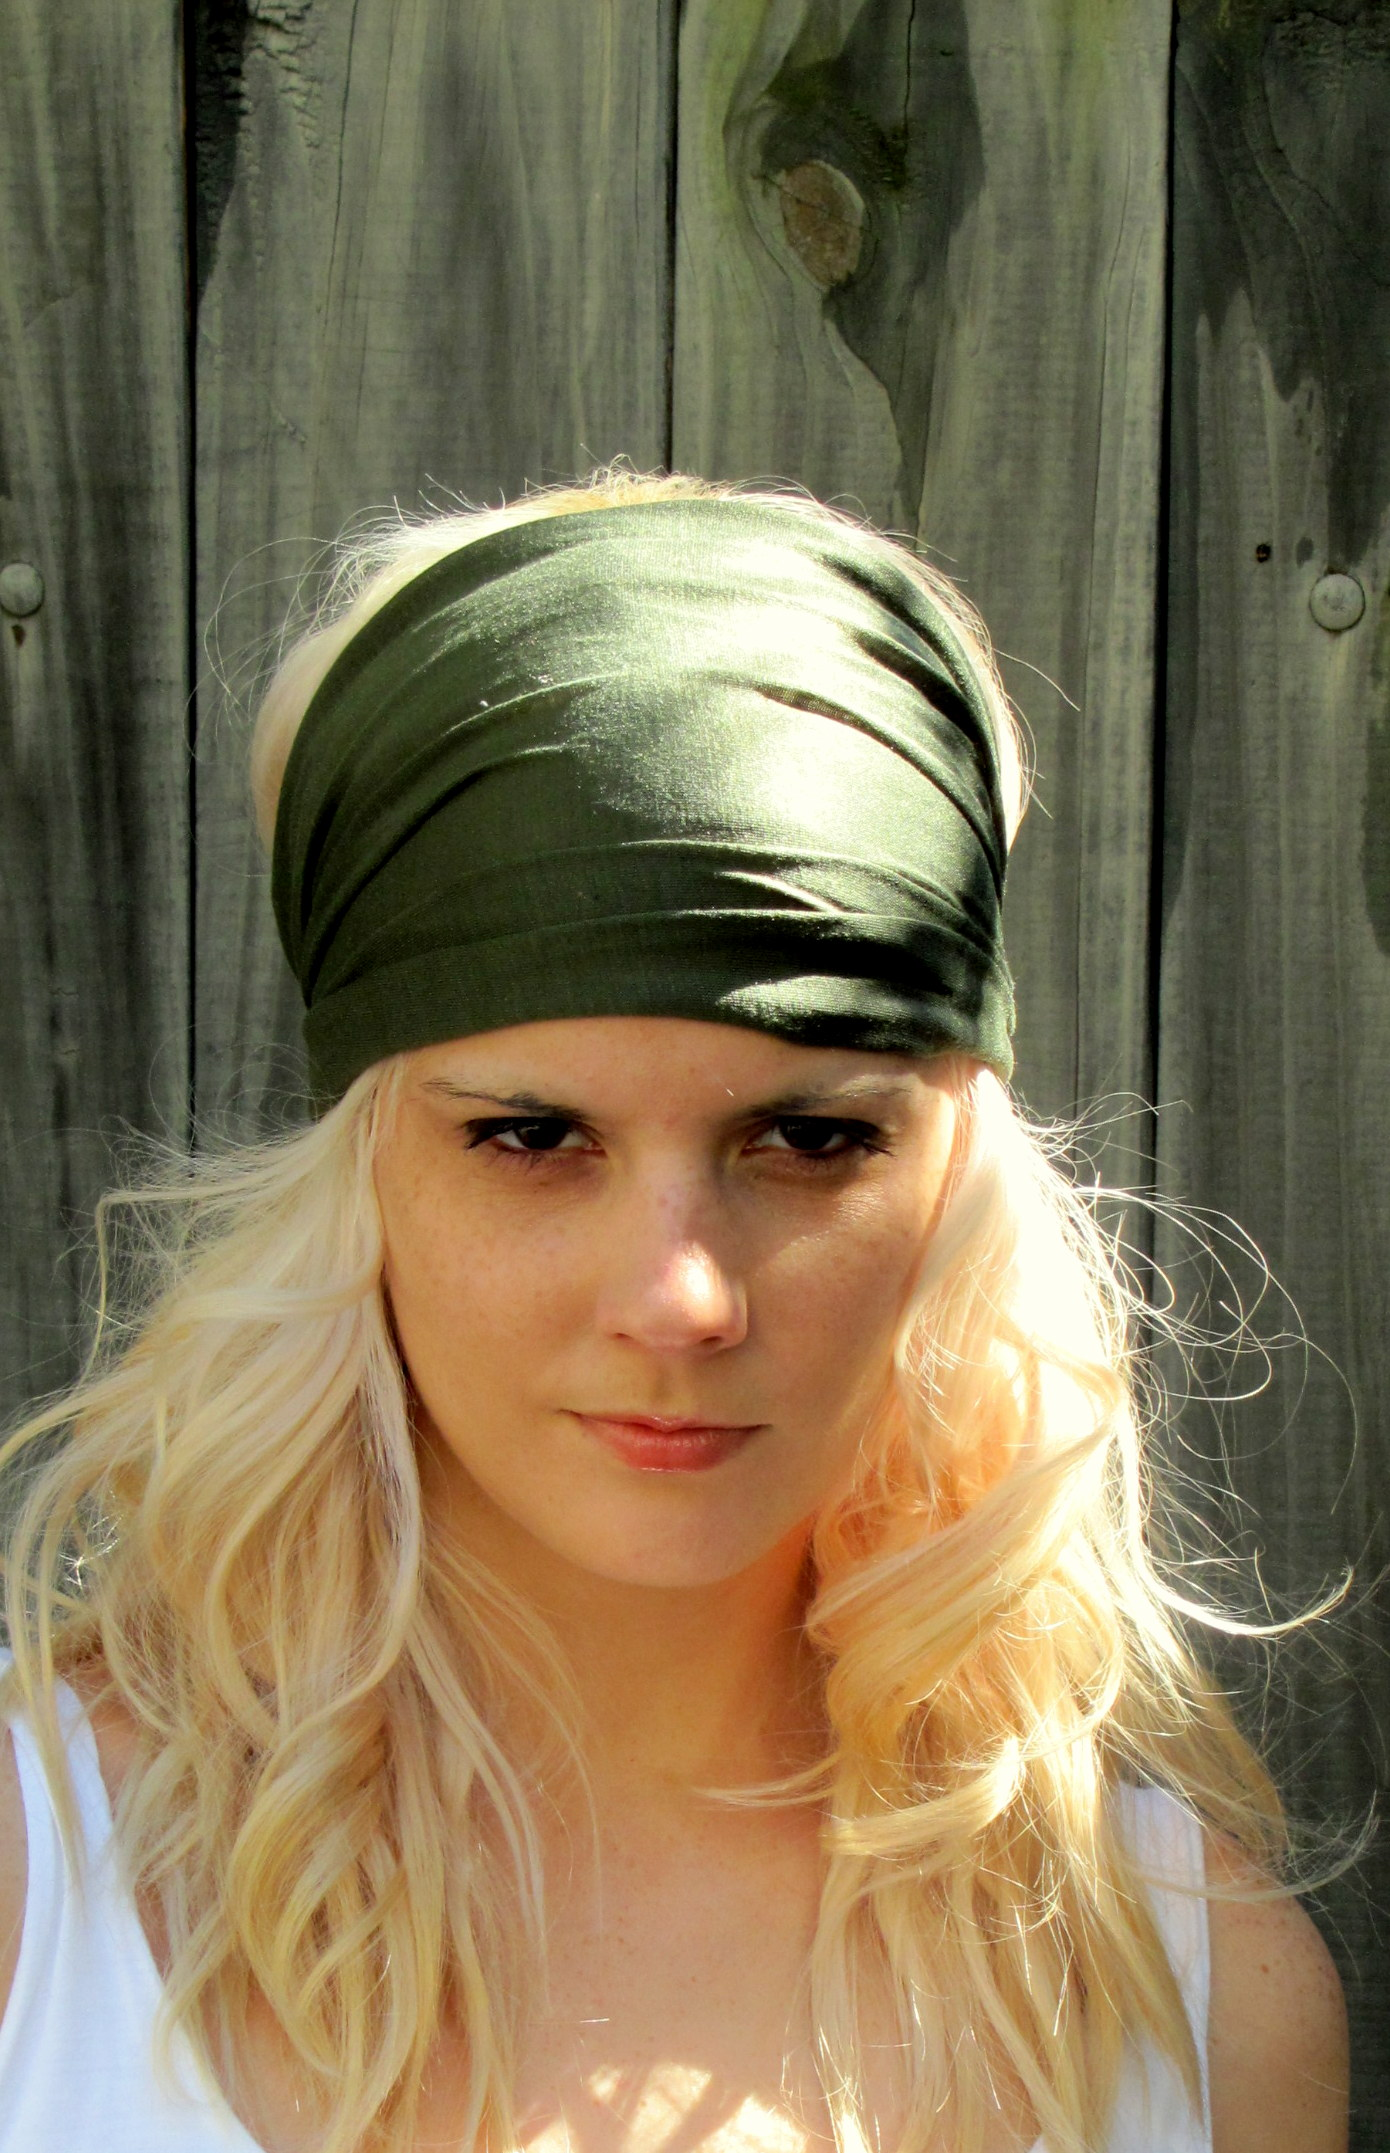 ... Cotton Stretchy Jersey Yoga Headband Wide Women s Turban Headband -  Thumbnail ... a959abe34b5